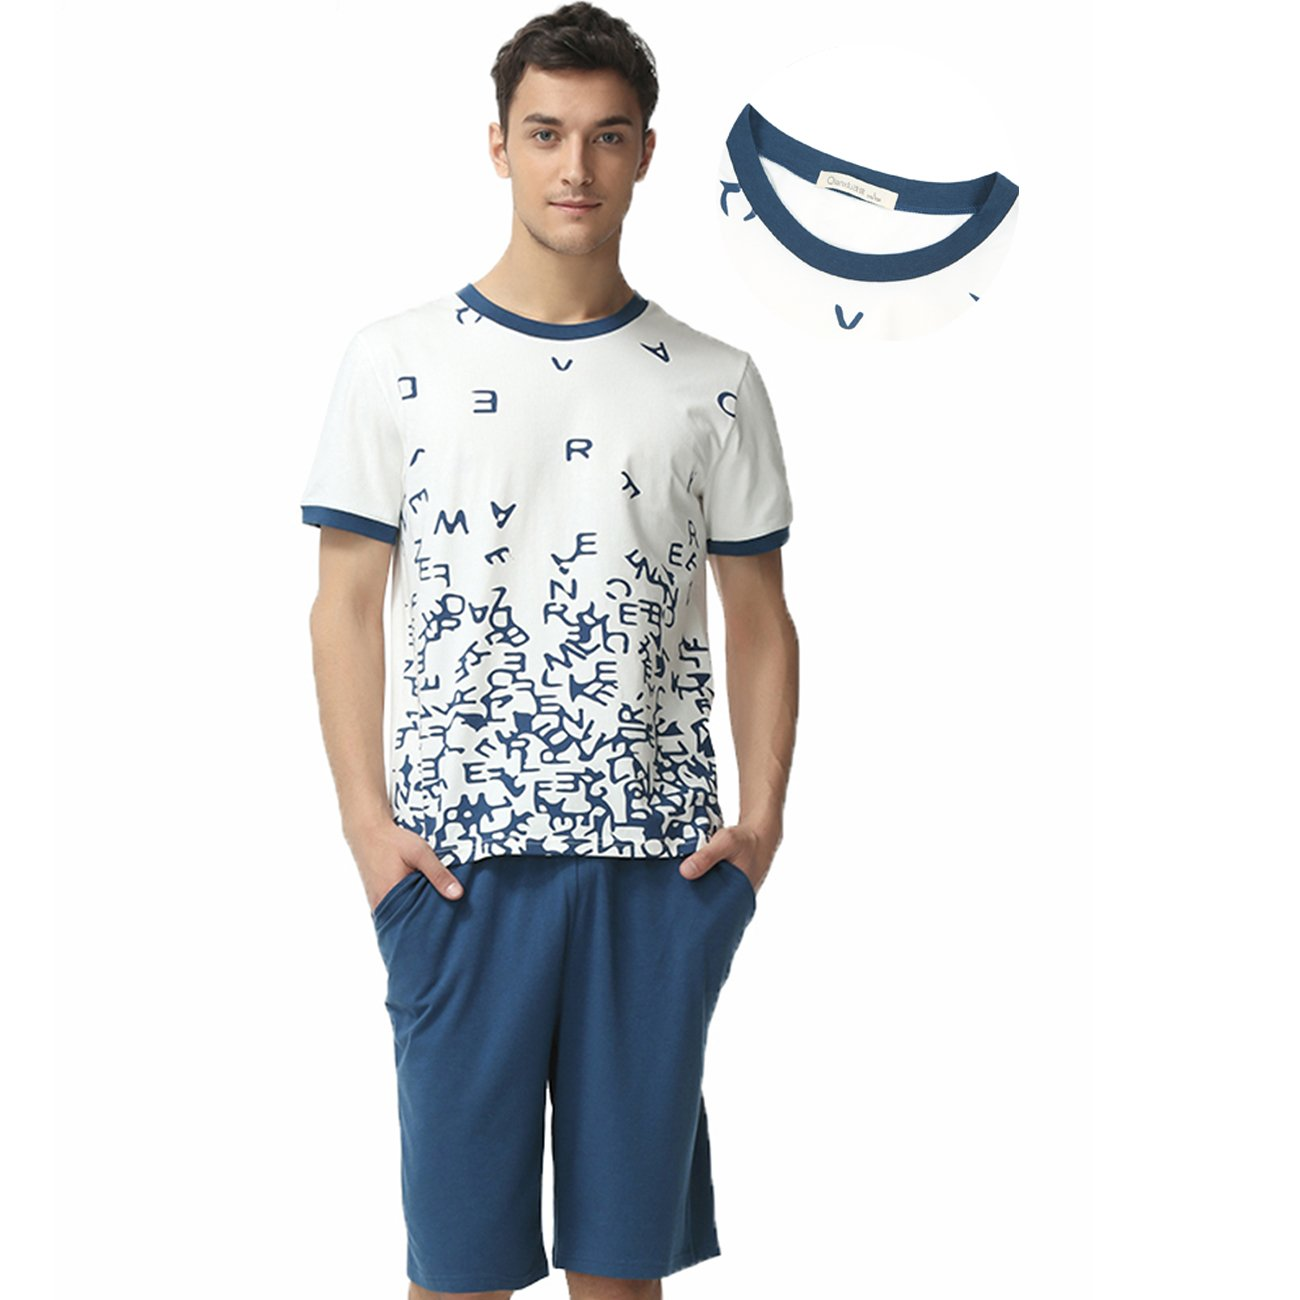 QIANXIU Men's Summer Cotton Short Sleeve Sleepwear Shorts and Top Pajama Set